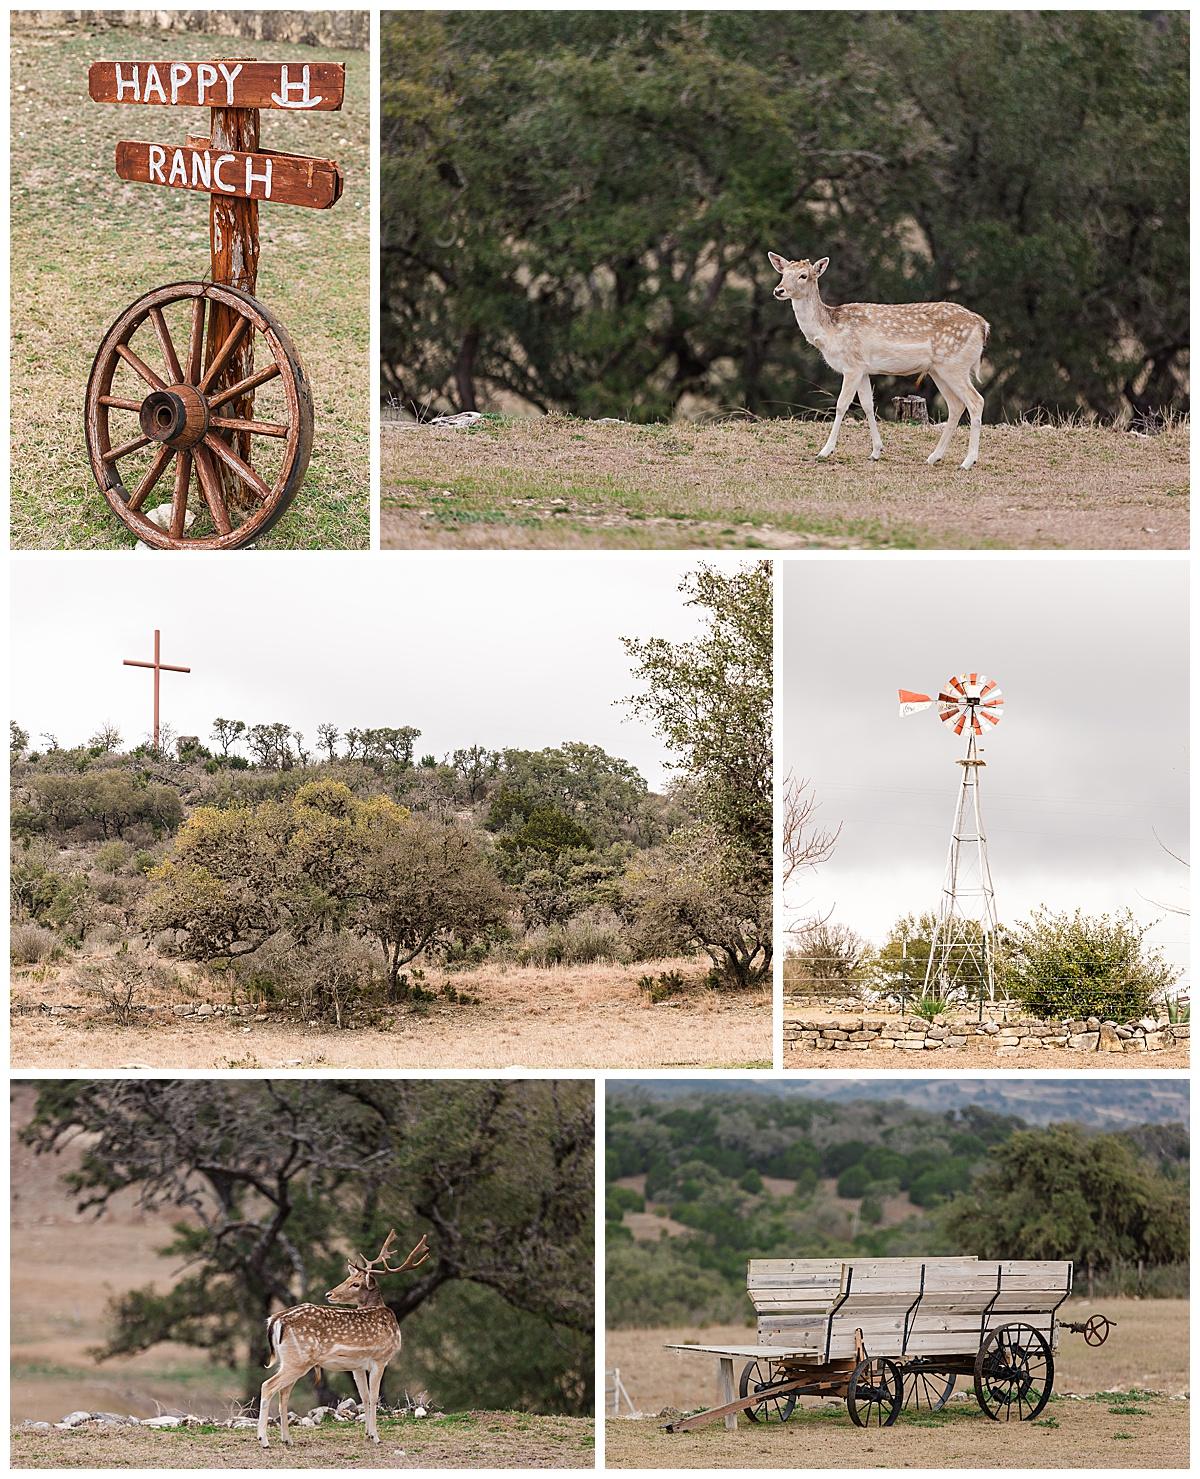 Wedding-Photographer-Texas-Hill-Country-Happy-H-Ranch-Comfor-Texas-Carly-Barton-Photography_0001.jpg